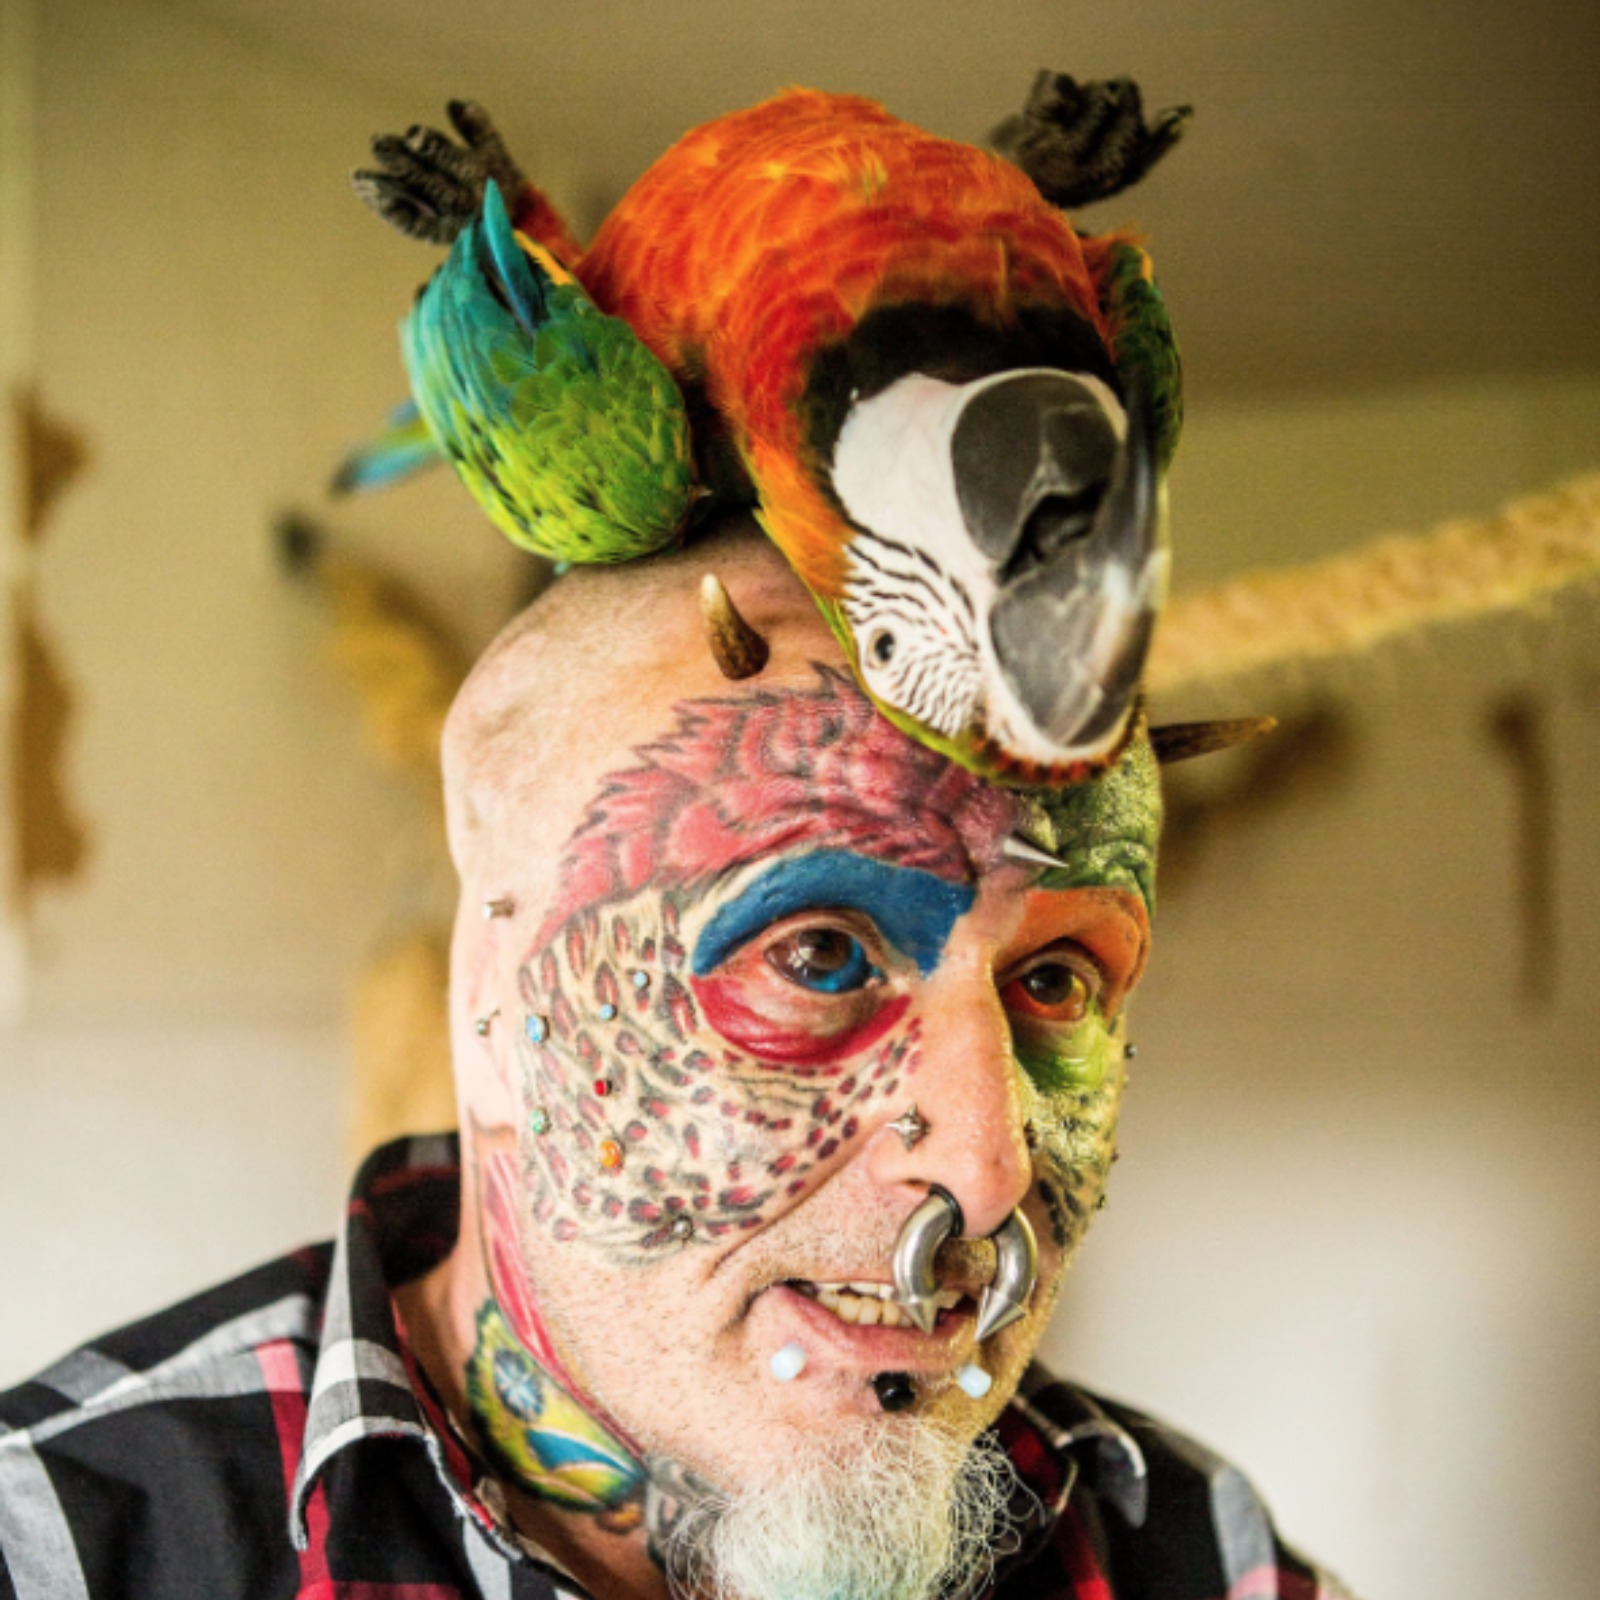 Man horrifies surgeons by having his ears cut off to look